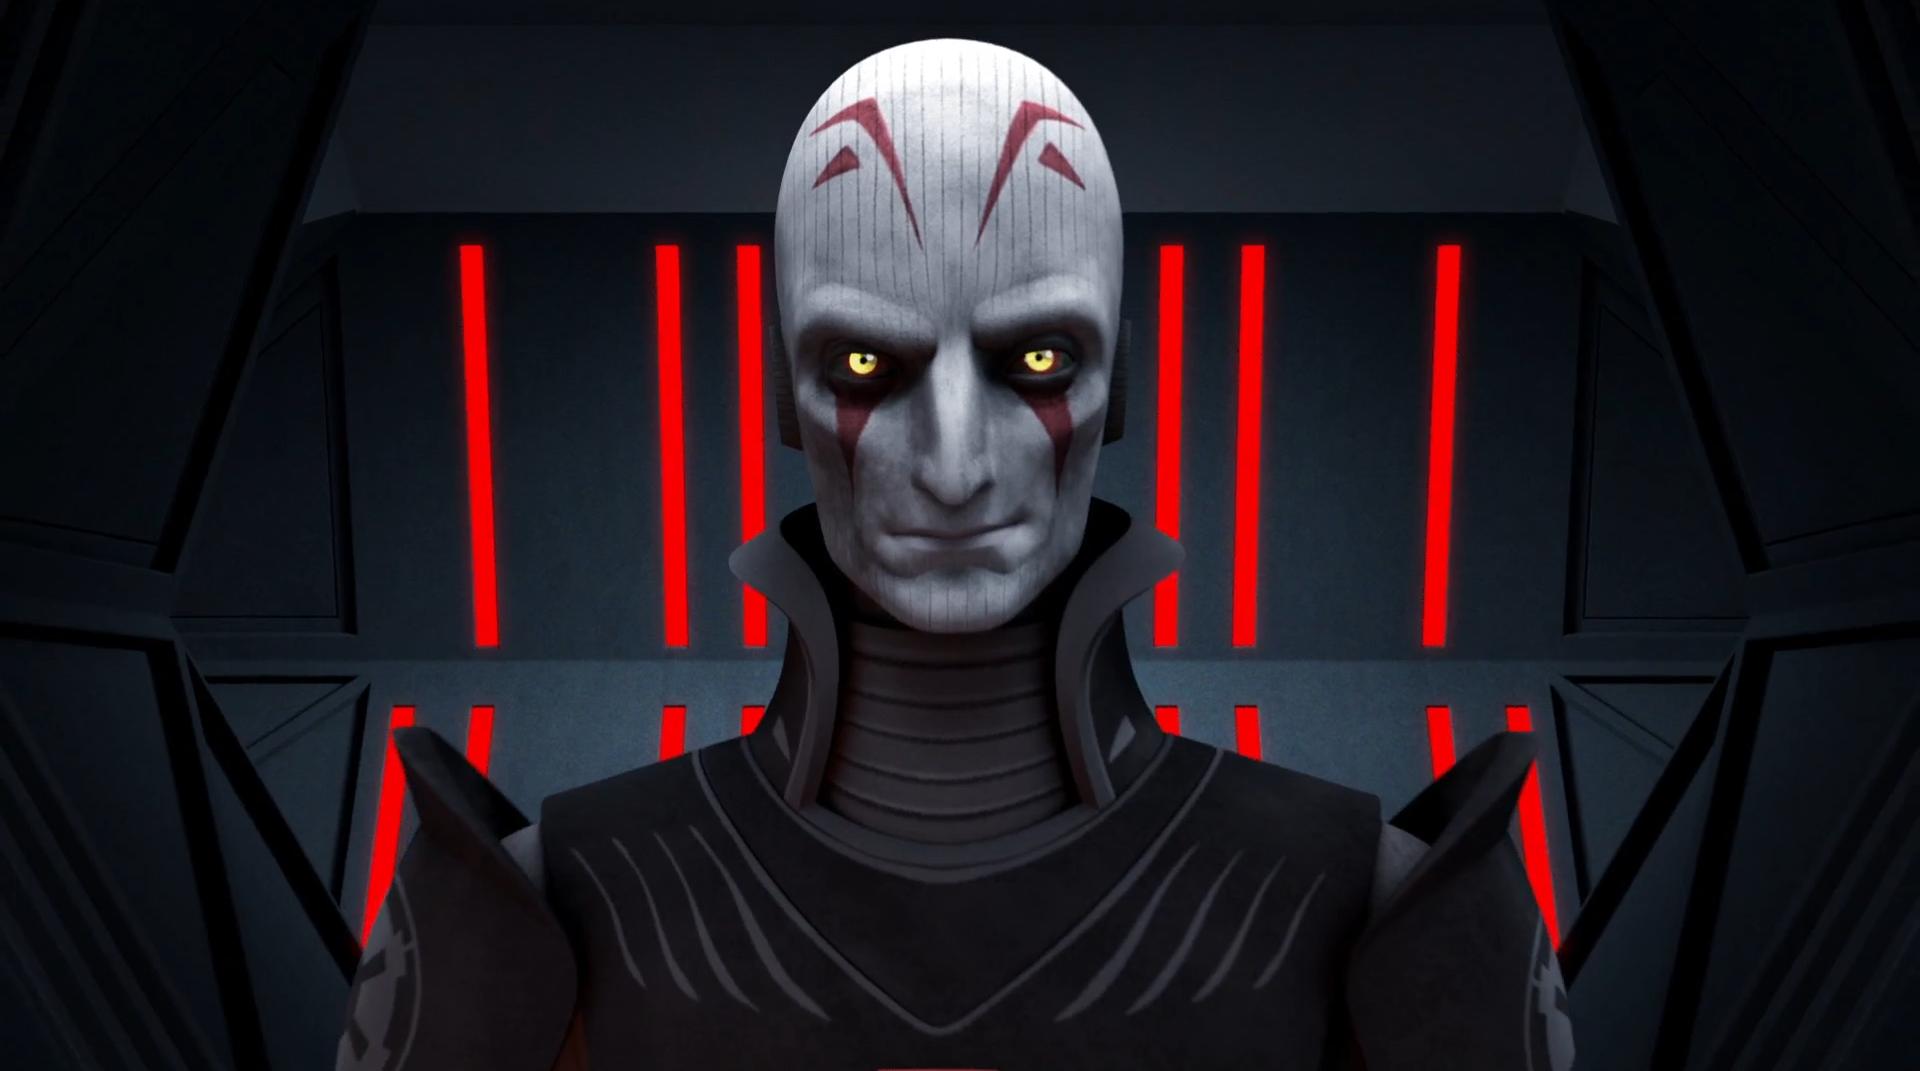 star wars rebels meet the inquisitor movie